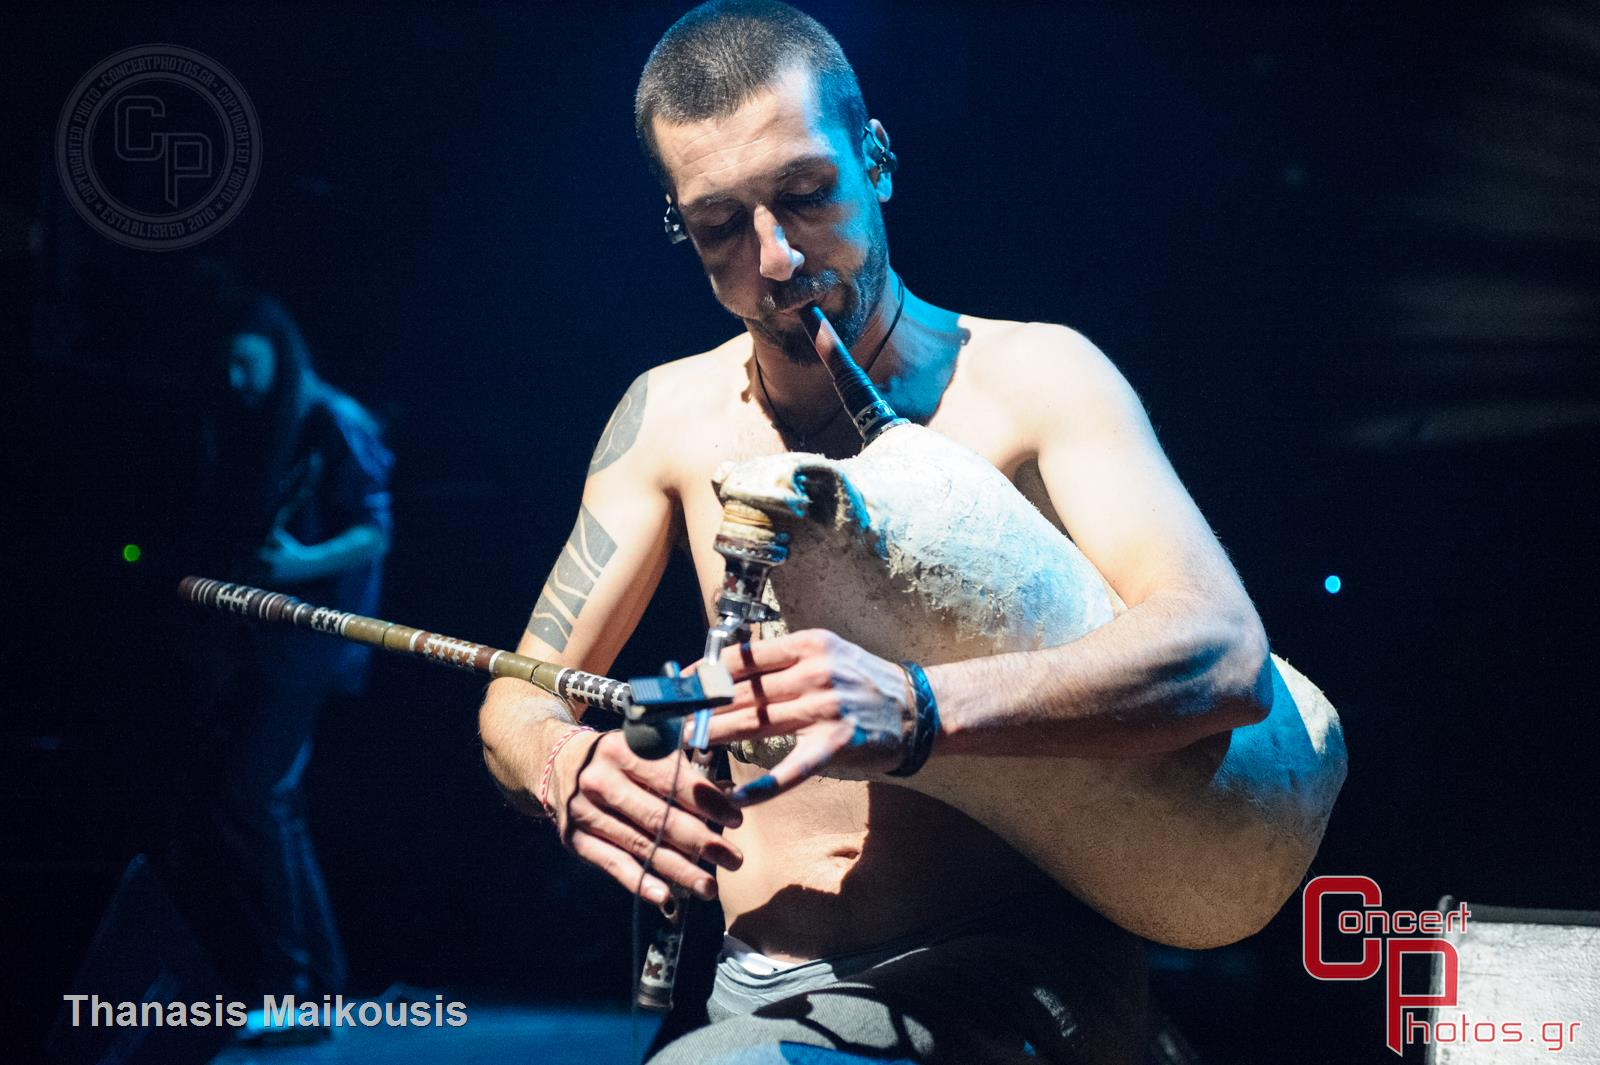 Villagers Of Ioannina City (V.I.C.) & Smallman-Villagers Of Ioannina City (V.I.C.) Smallman photographer: Thanasis Maikousis - concertphotos_20141115_22_17_19